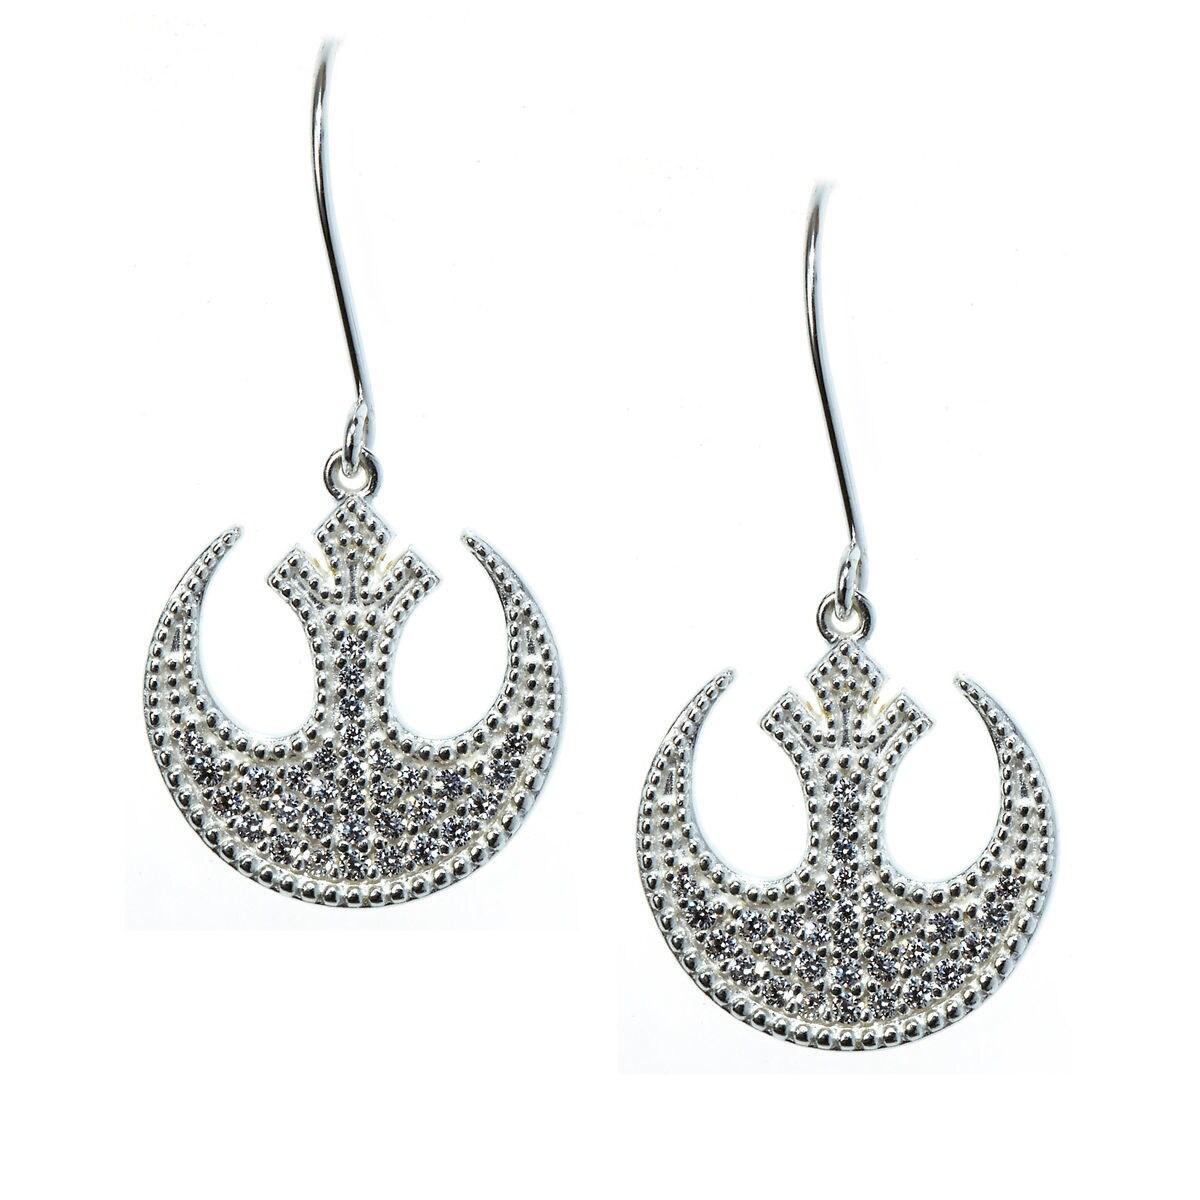 Product Image Of Rebel Alliance Starbird Earrings By Rebecca Hook Star Wars 1